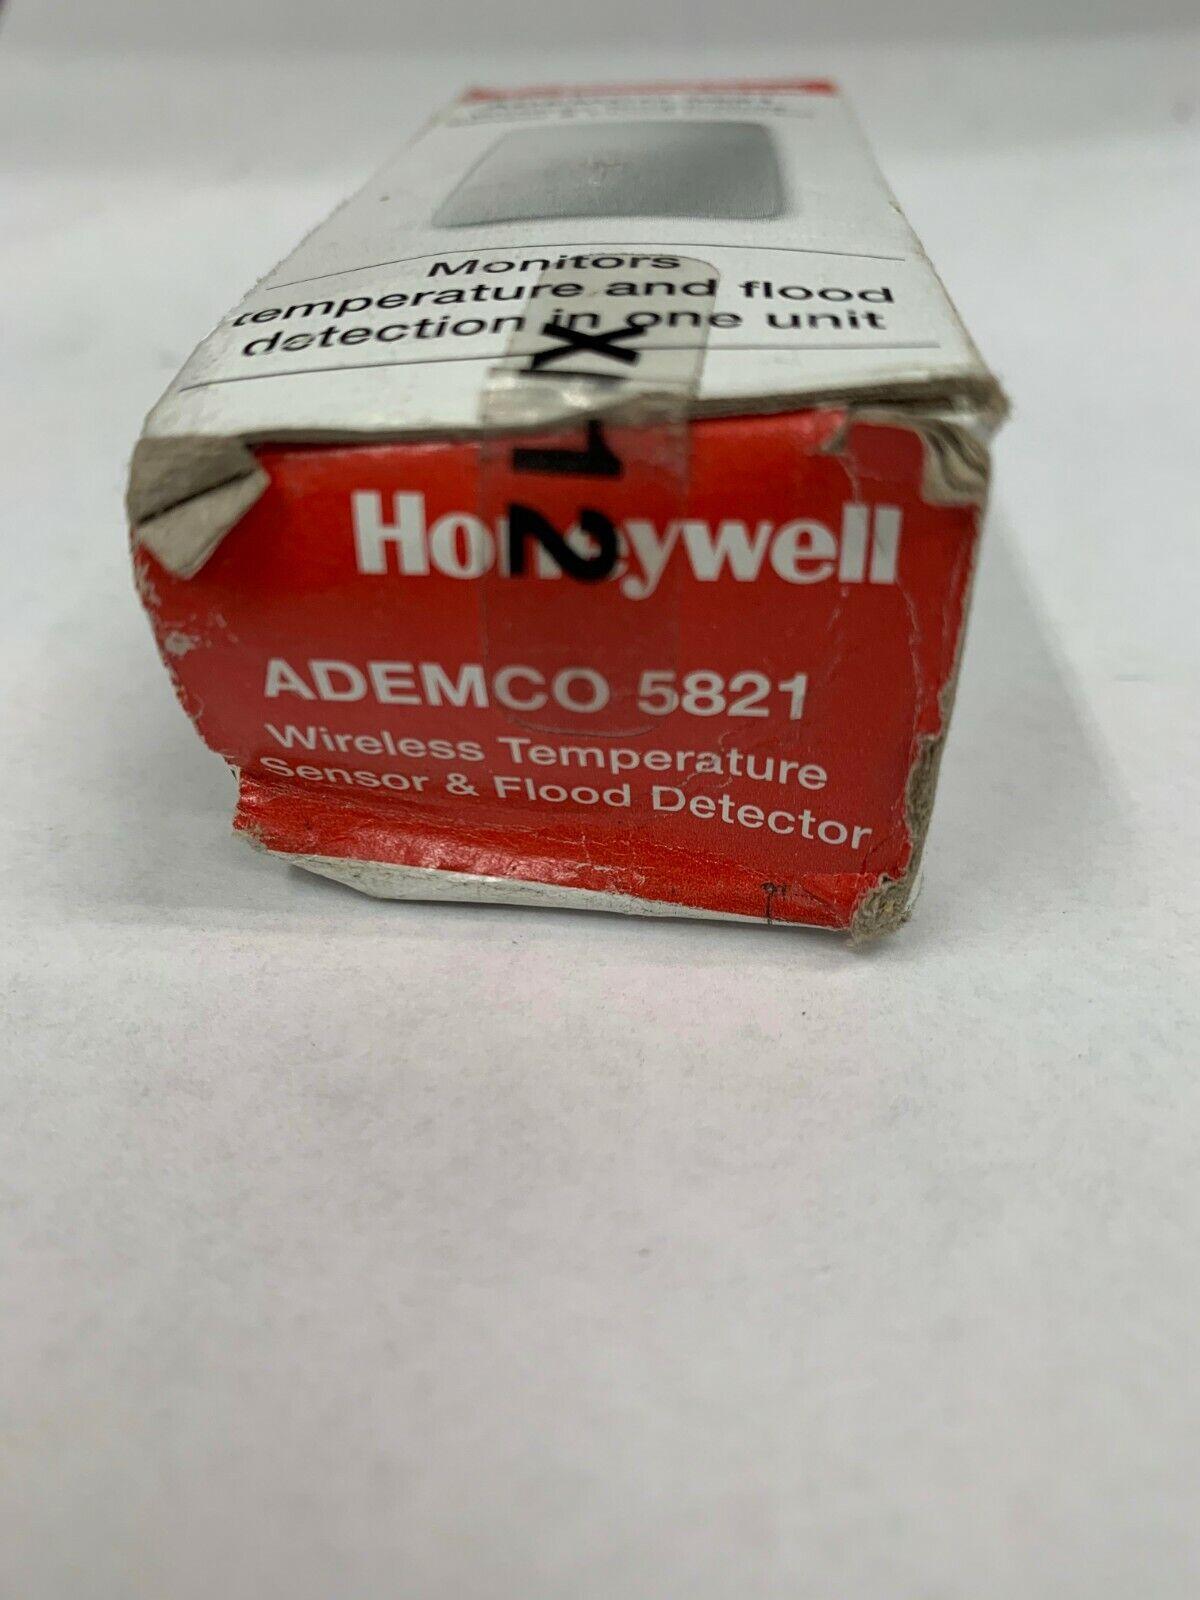 Honeywell Ademco 5821 Wireless Temperature Sensor Flood Detector - $44.95